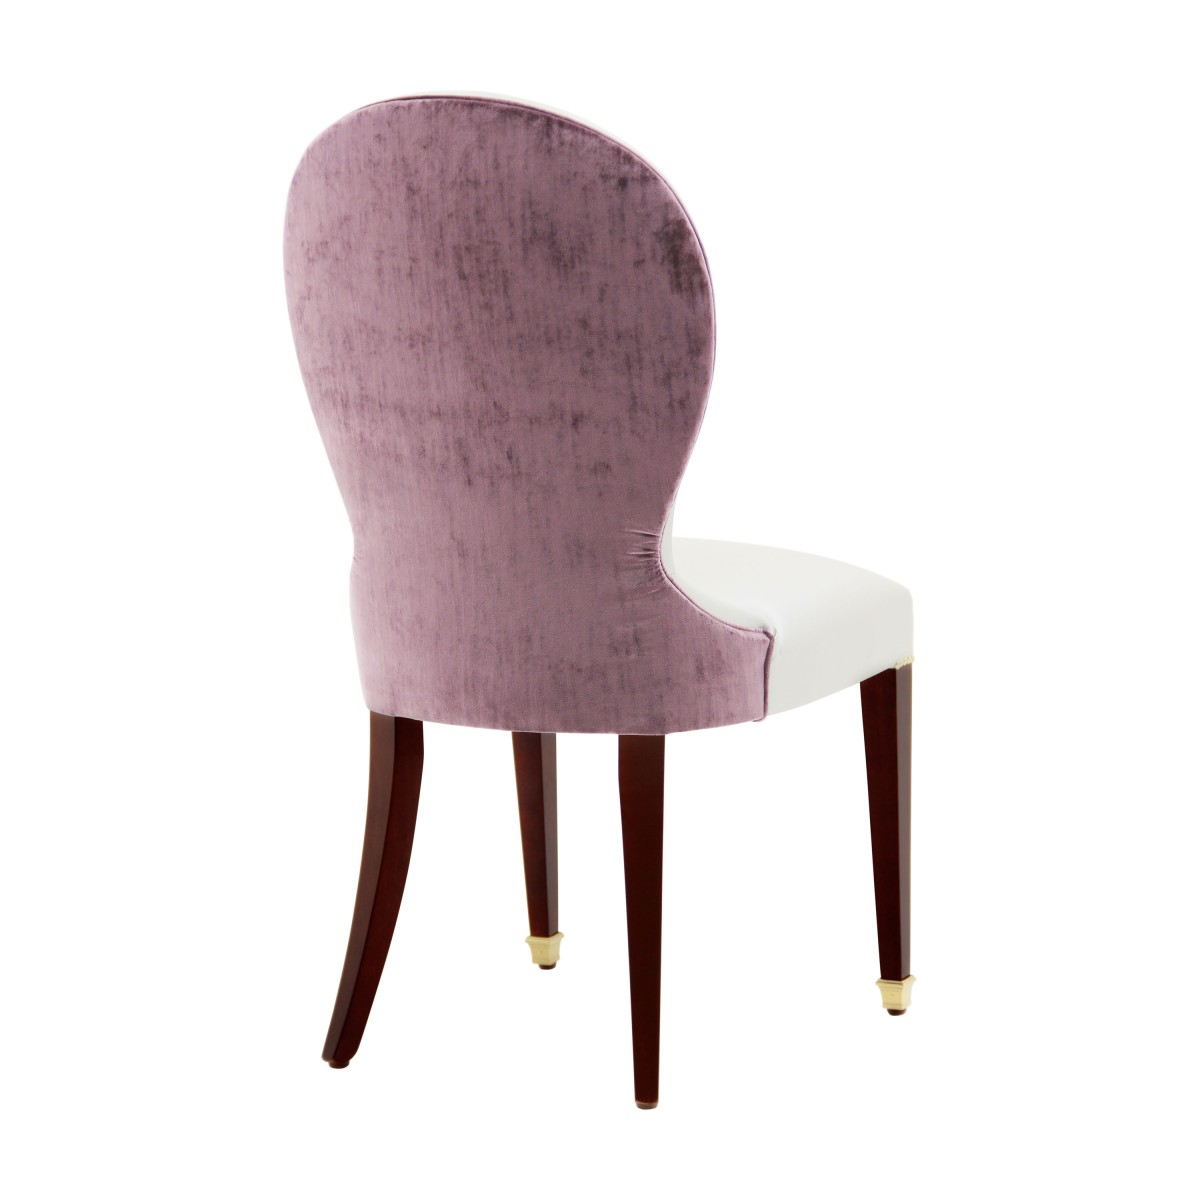 replica chair calipso 1 4102